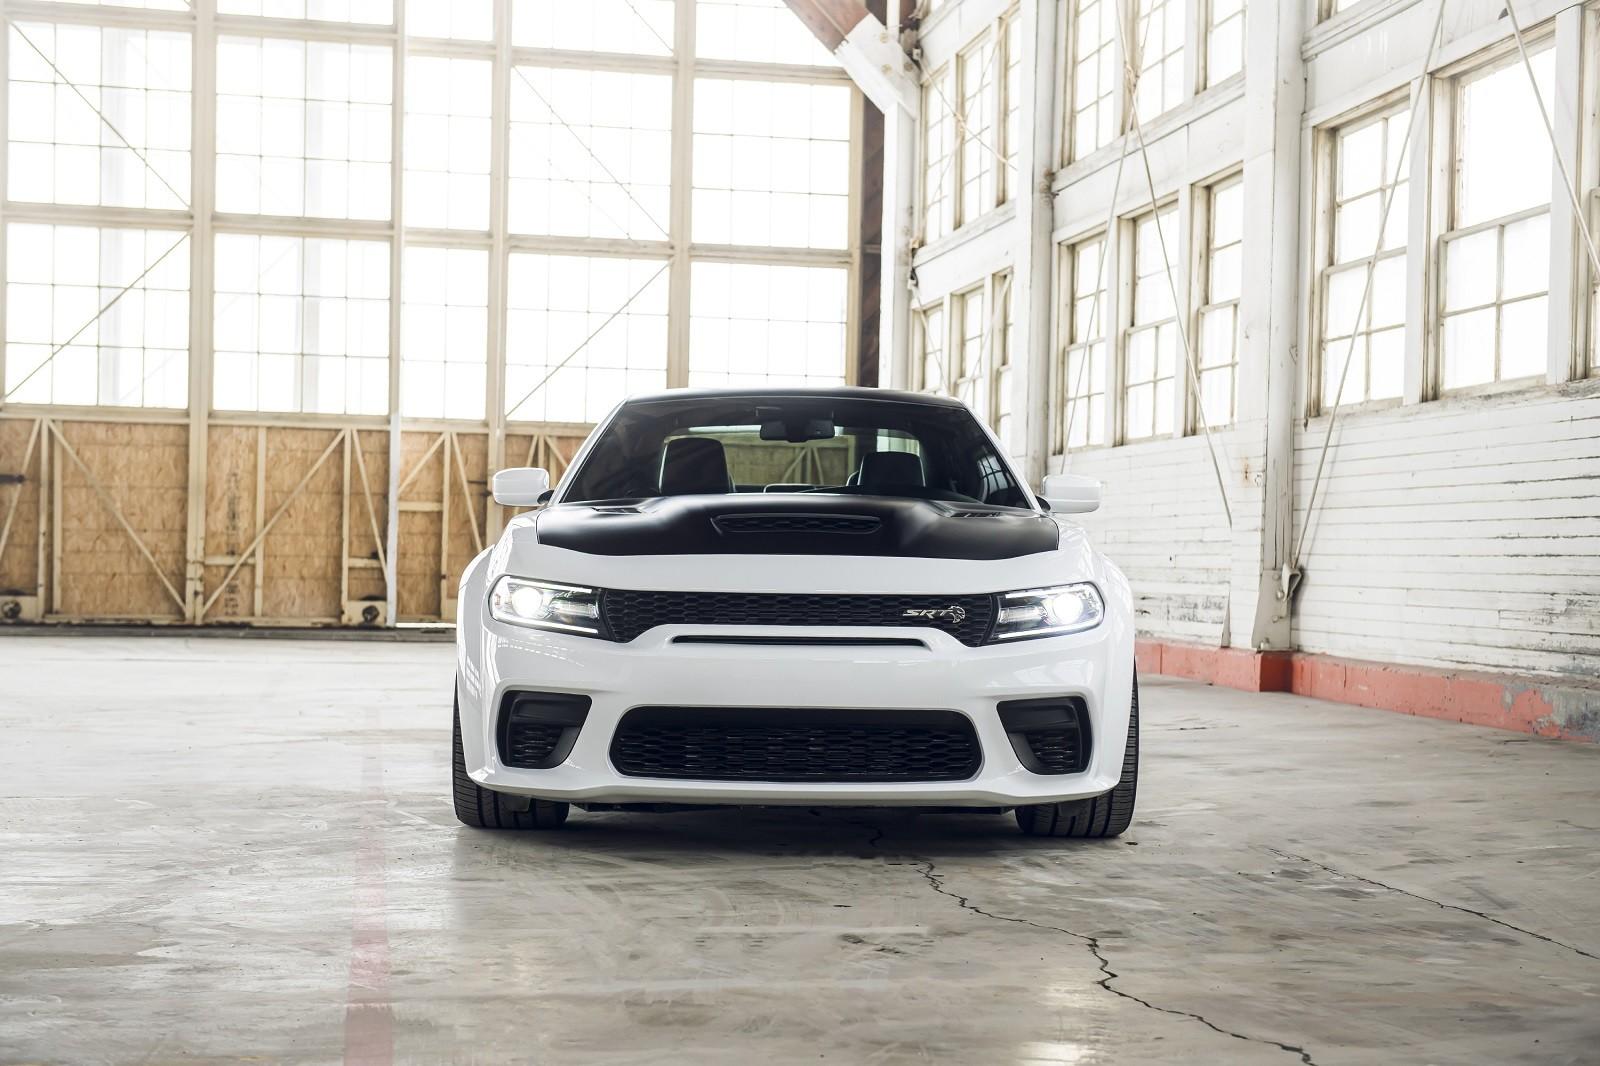 Foto de Dodge Charger SRT Hellcat Redeye 2021 (8/49)